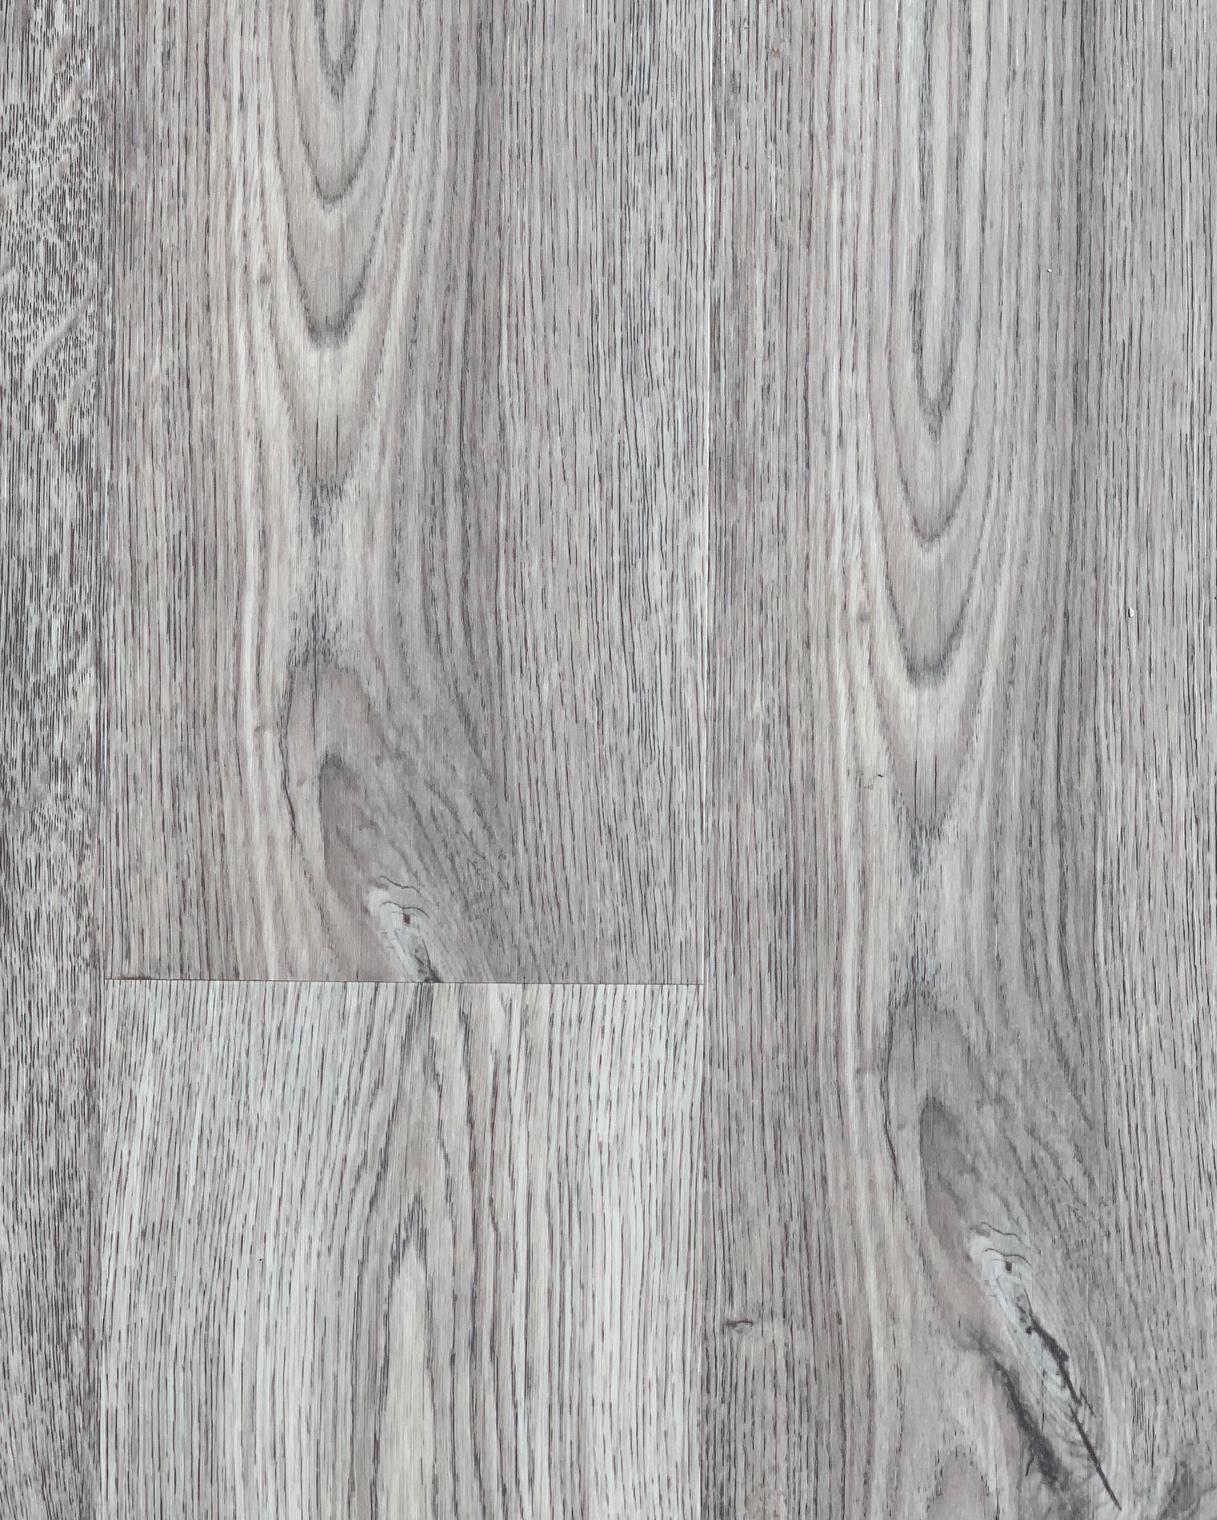 Oak Aquarius 2 99 Psf Sale Price Boardwalk Hardwood Floors